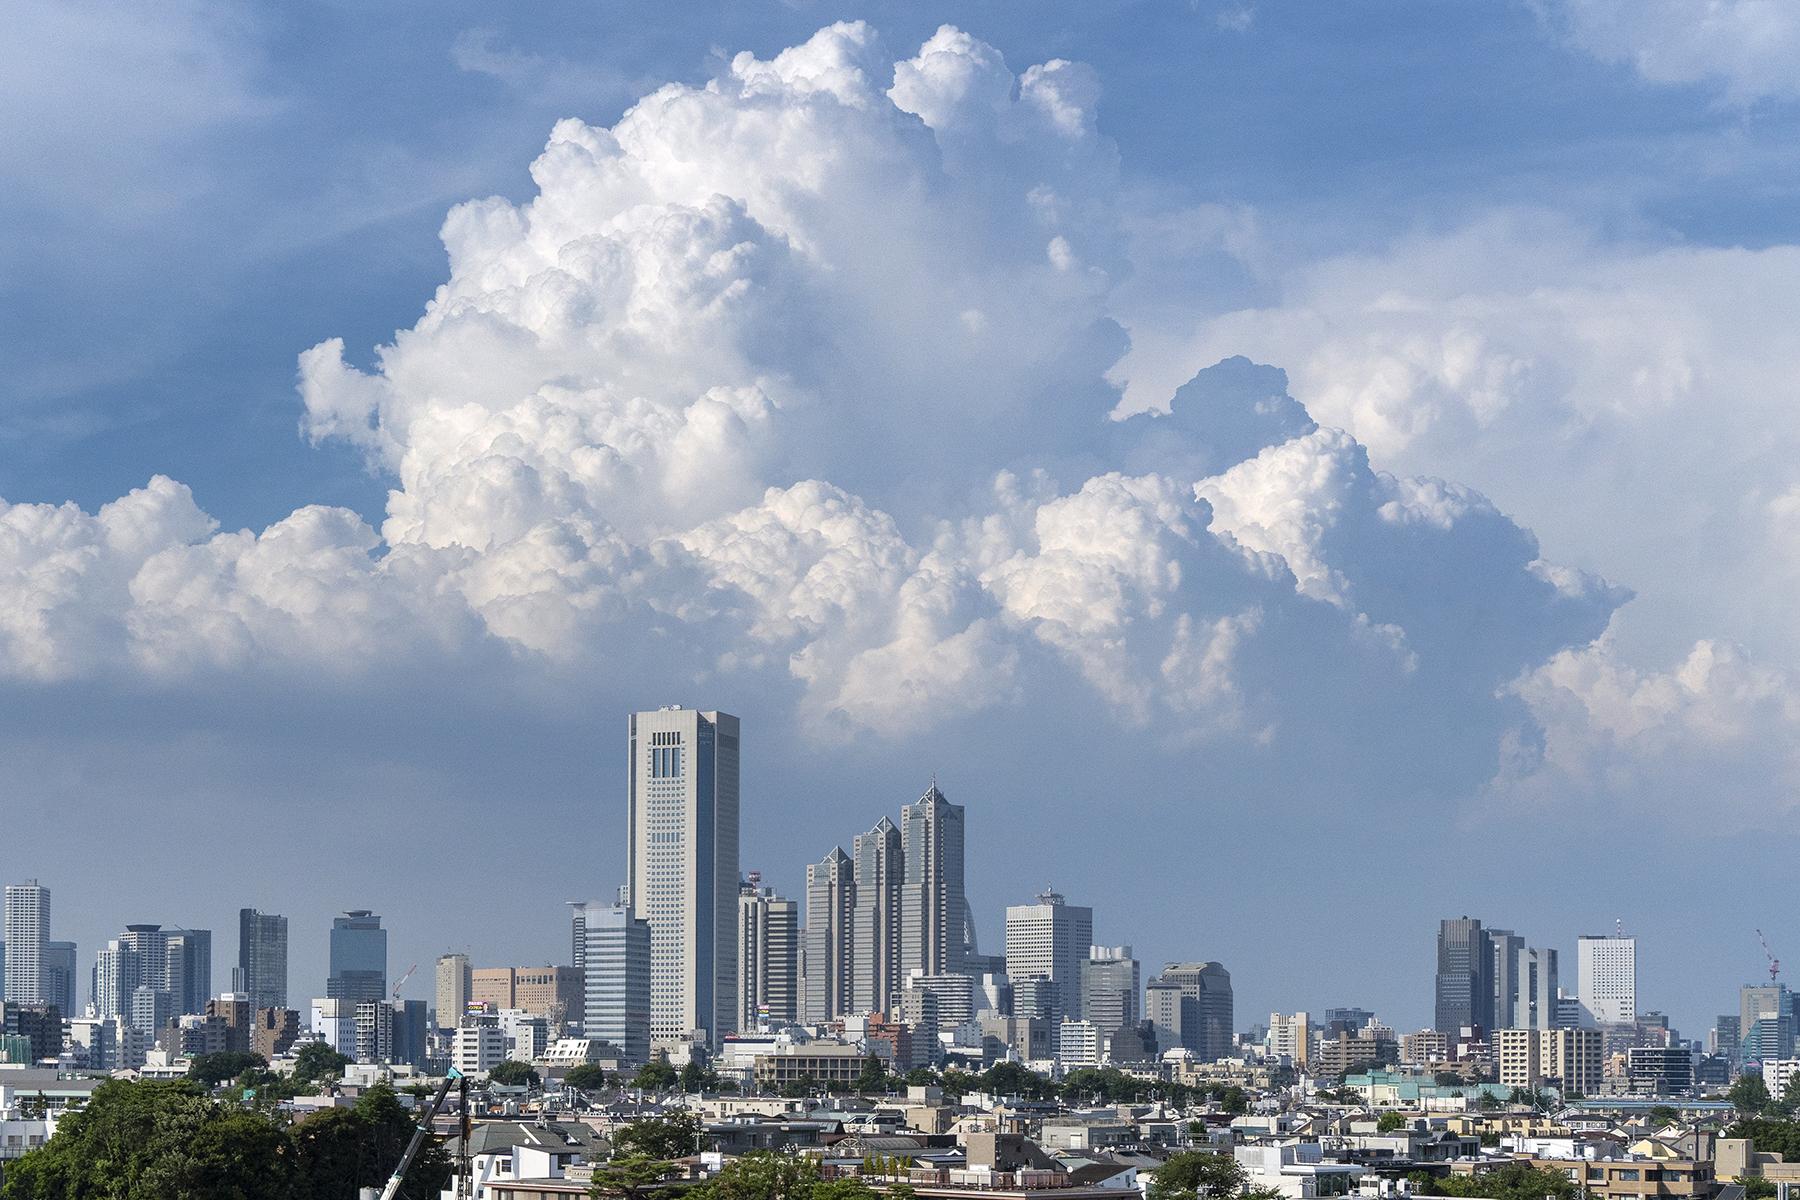 Studio TERRANOVA Cst 屋上バルコニー (スタジオテラノヴァ)ペントハウス内 ラウンドソファ